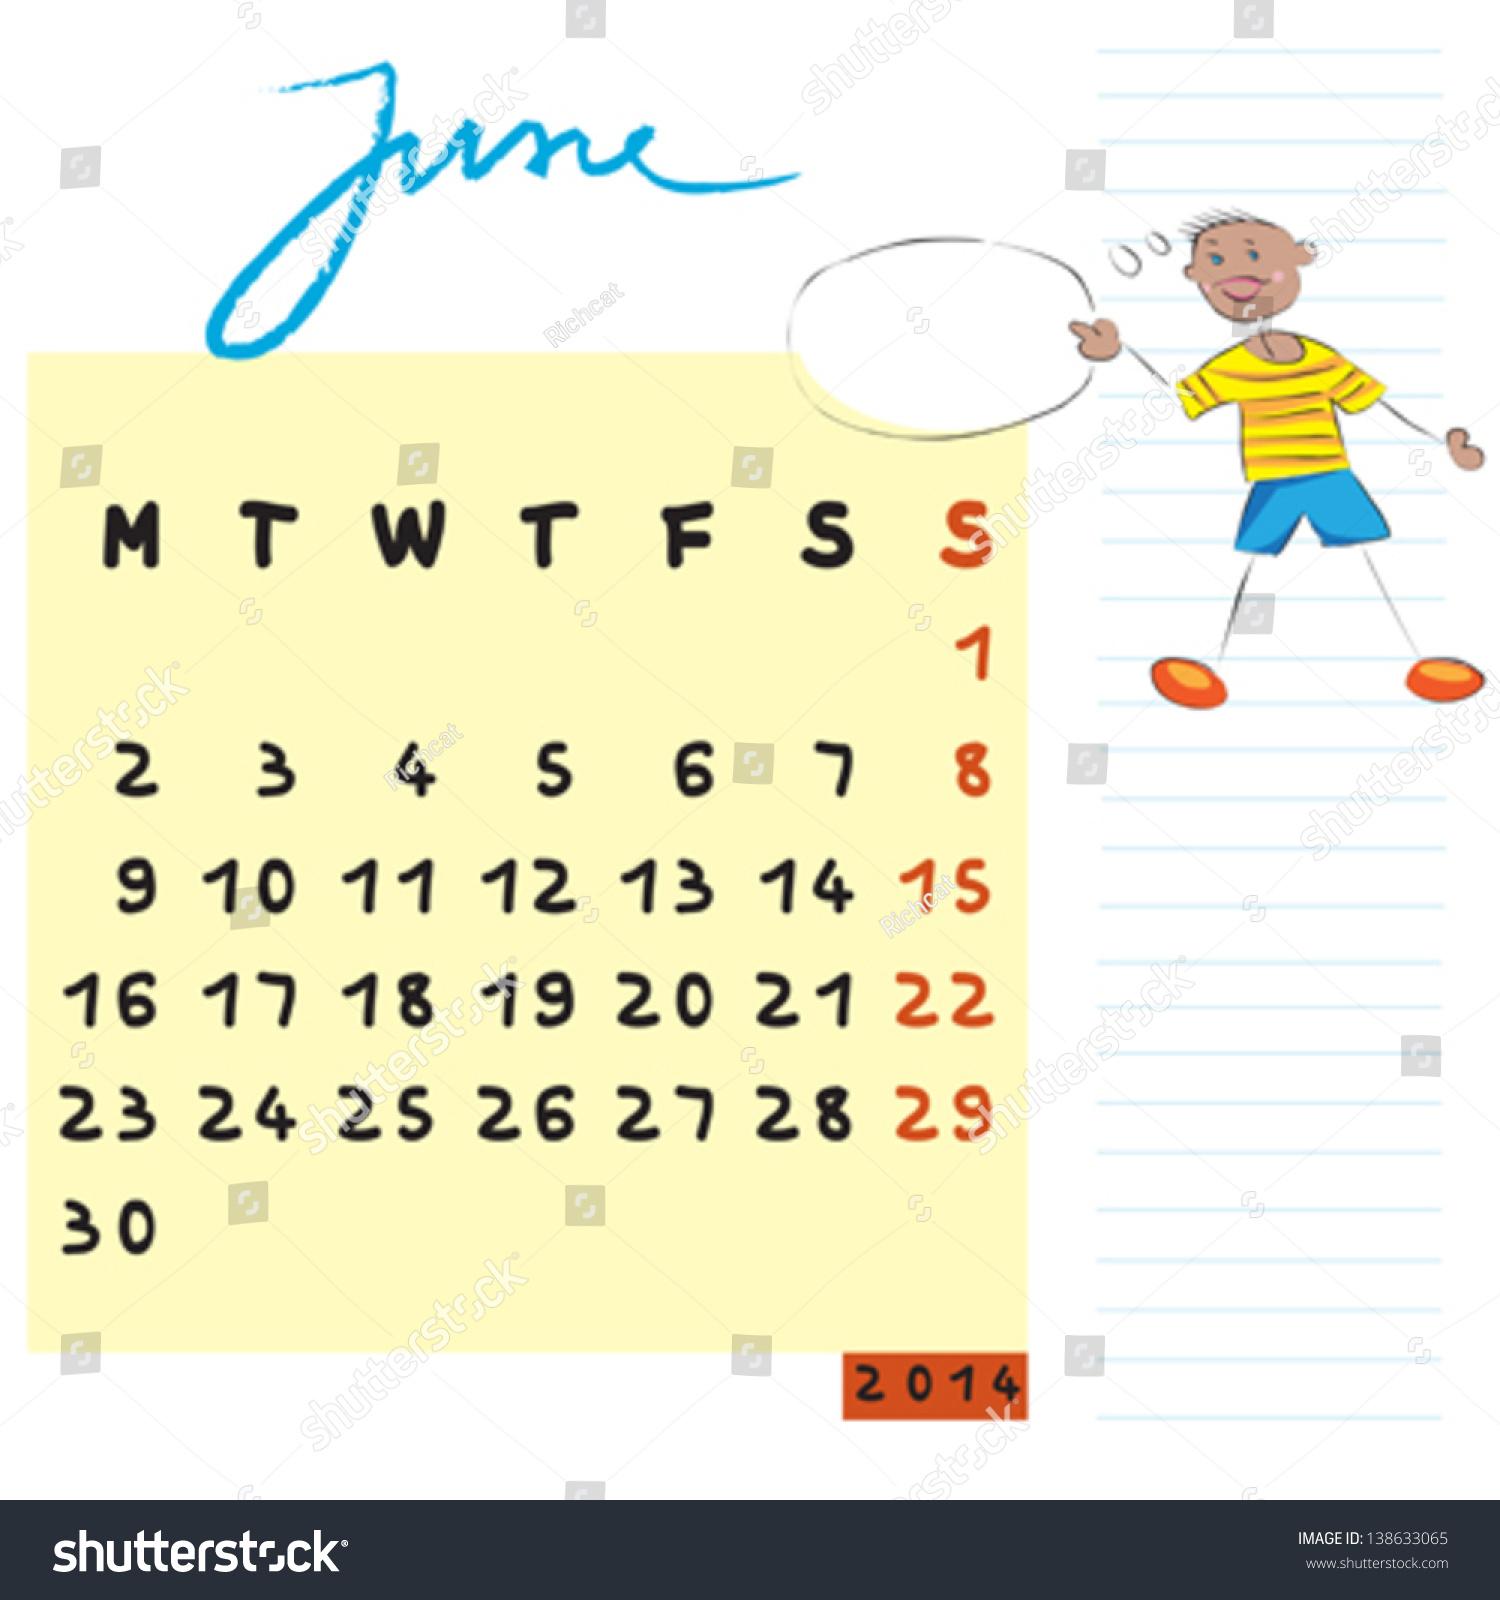 Calendar Illustration List : June calendar illustration hand drawn stock vector